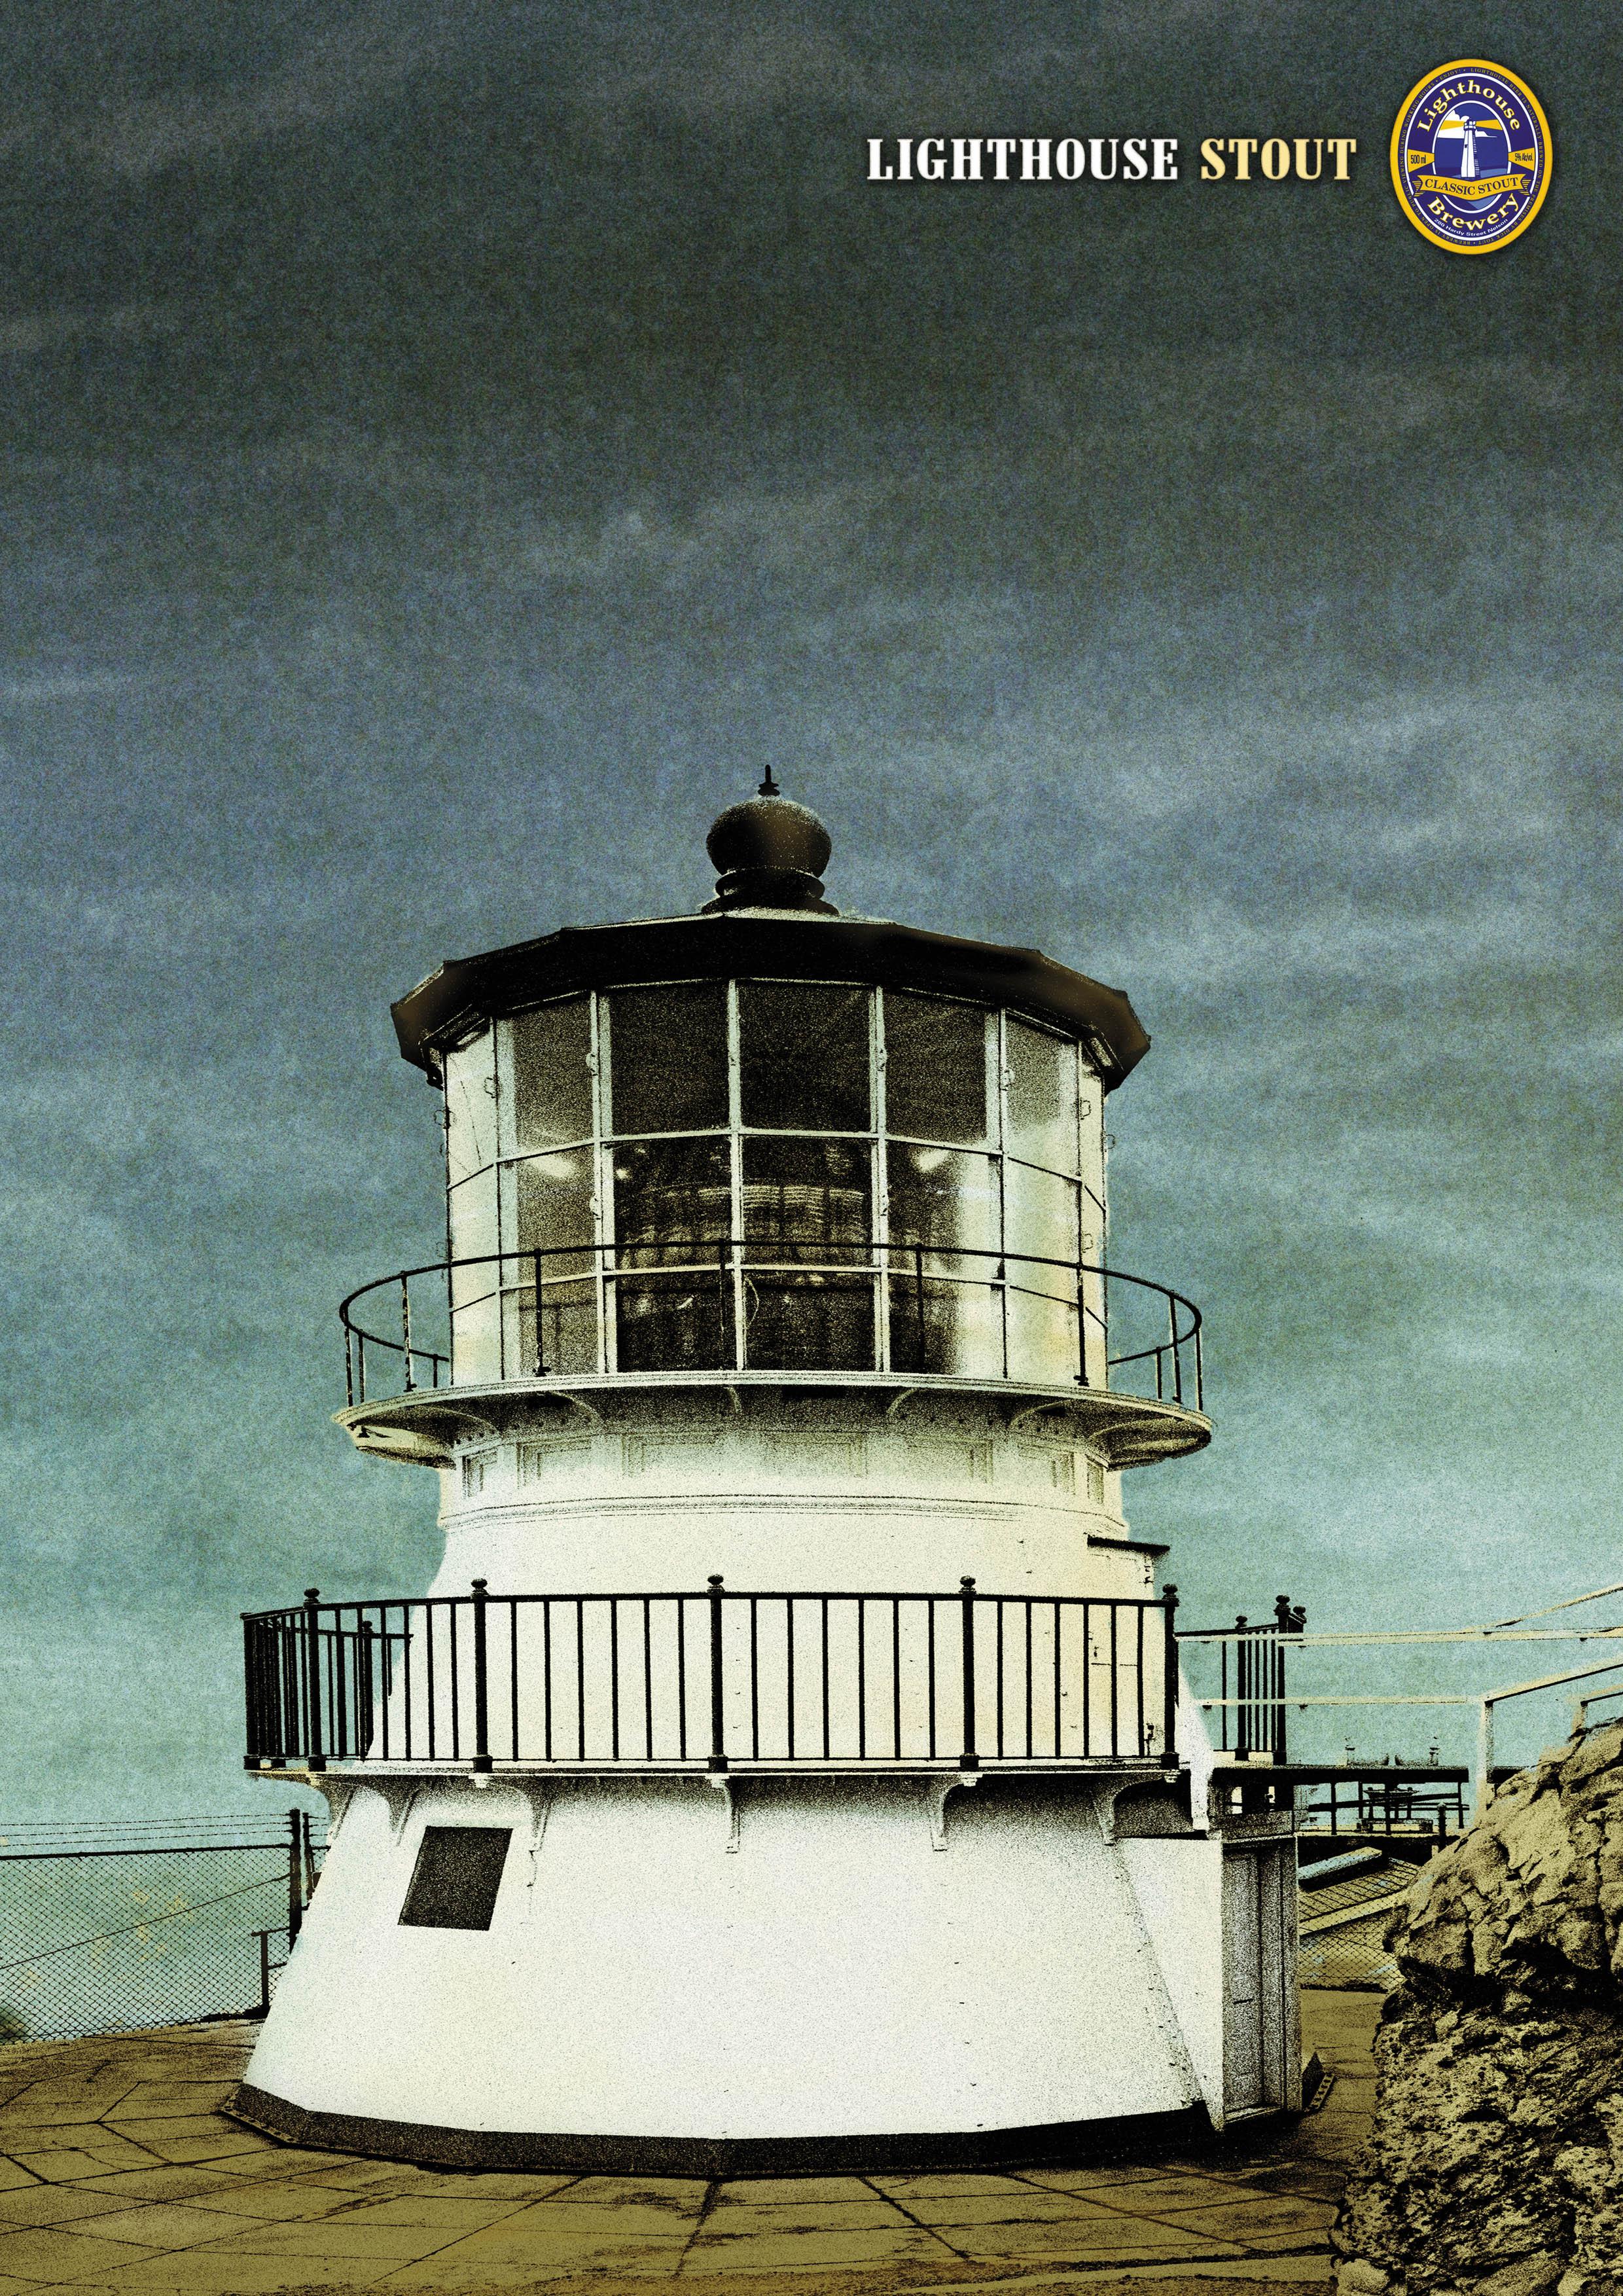 lighthousestout44.jpg